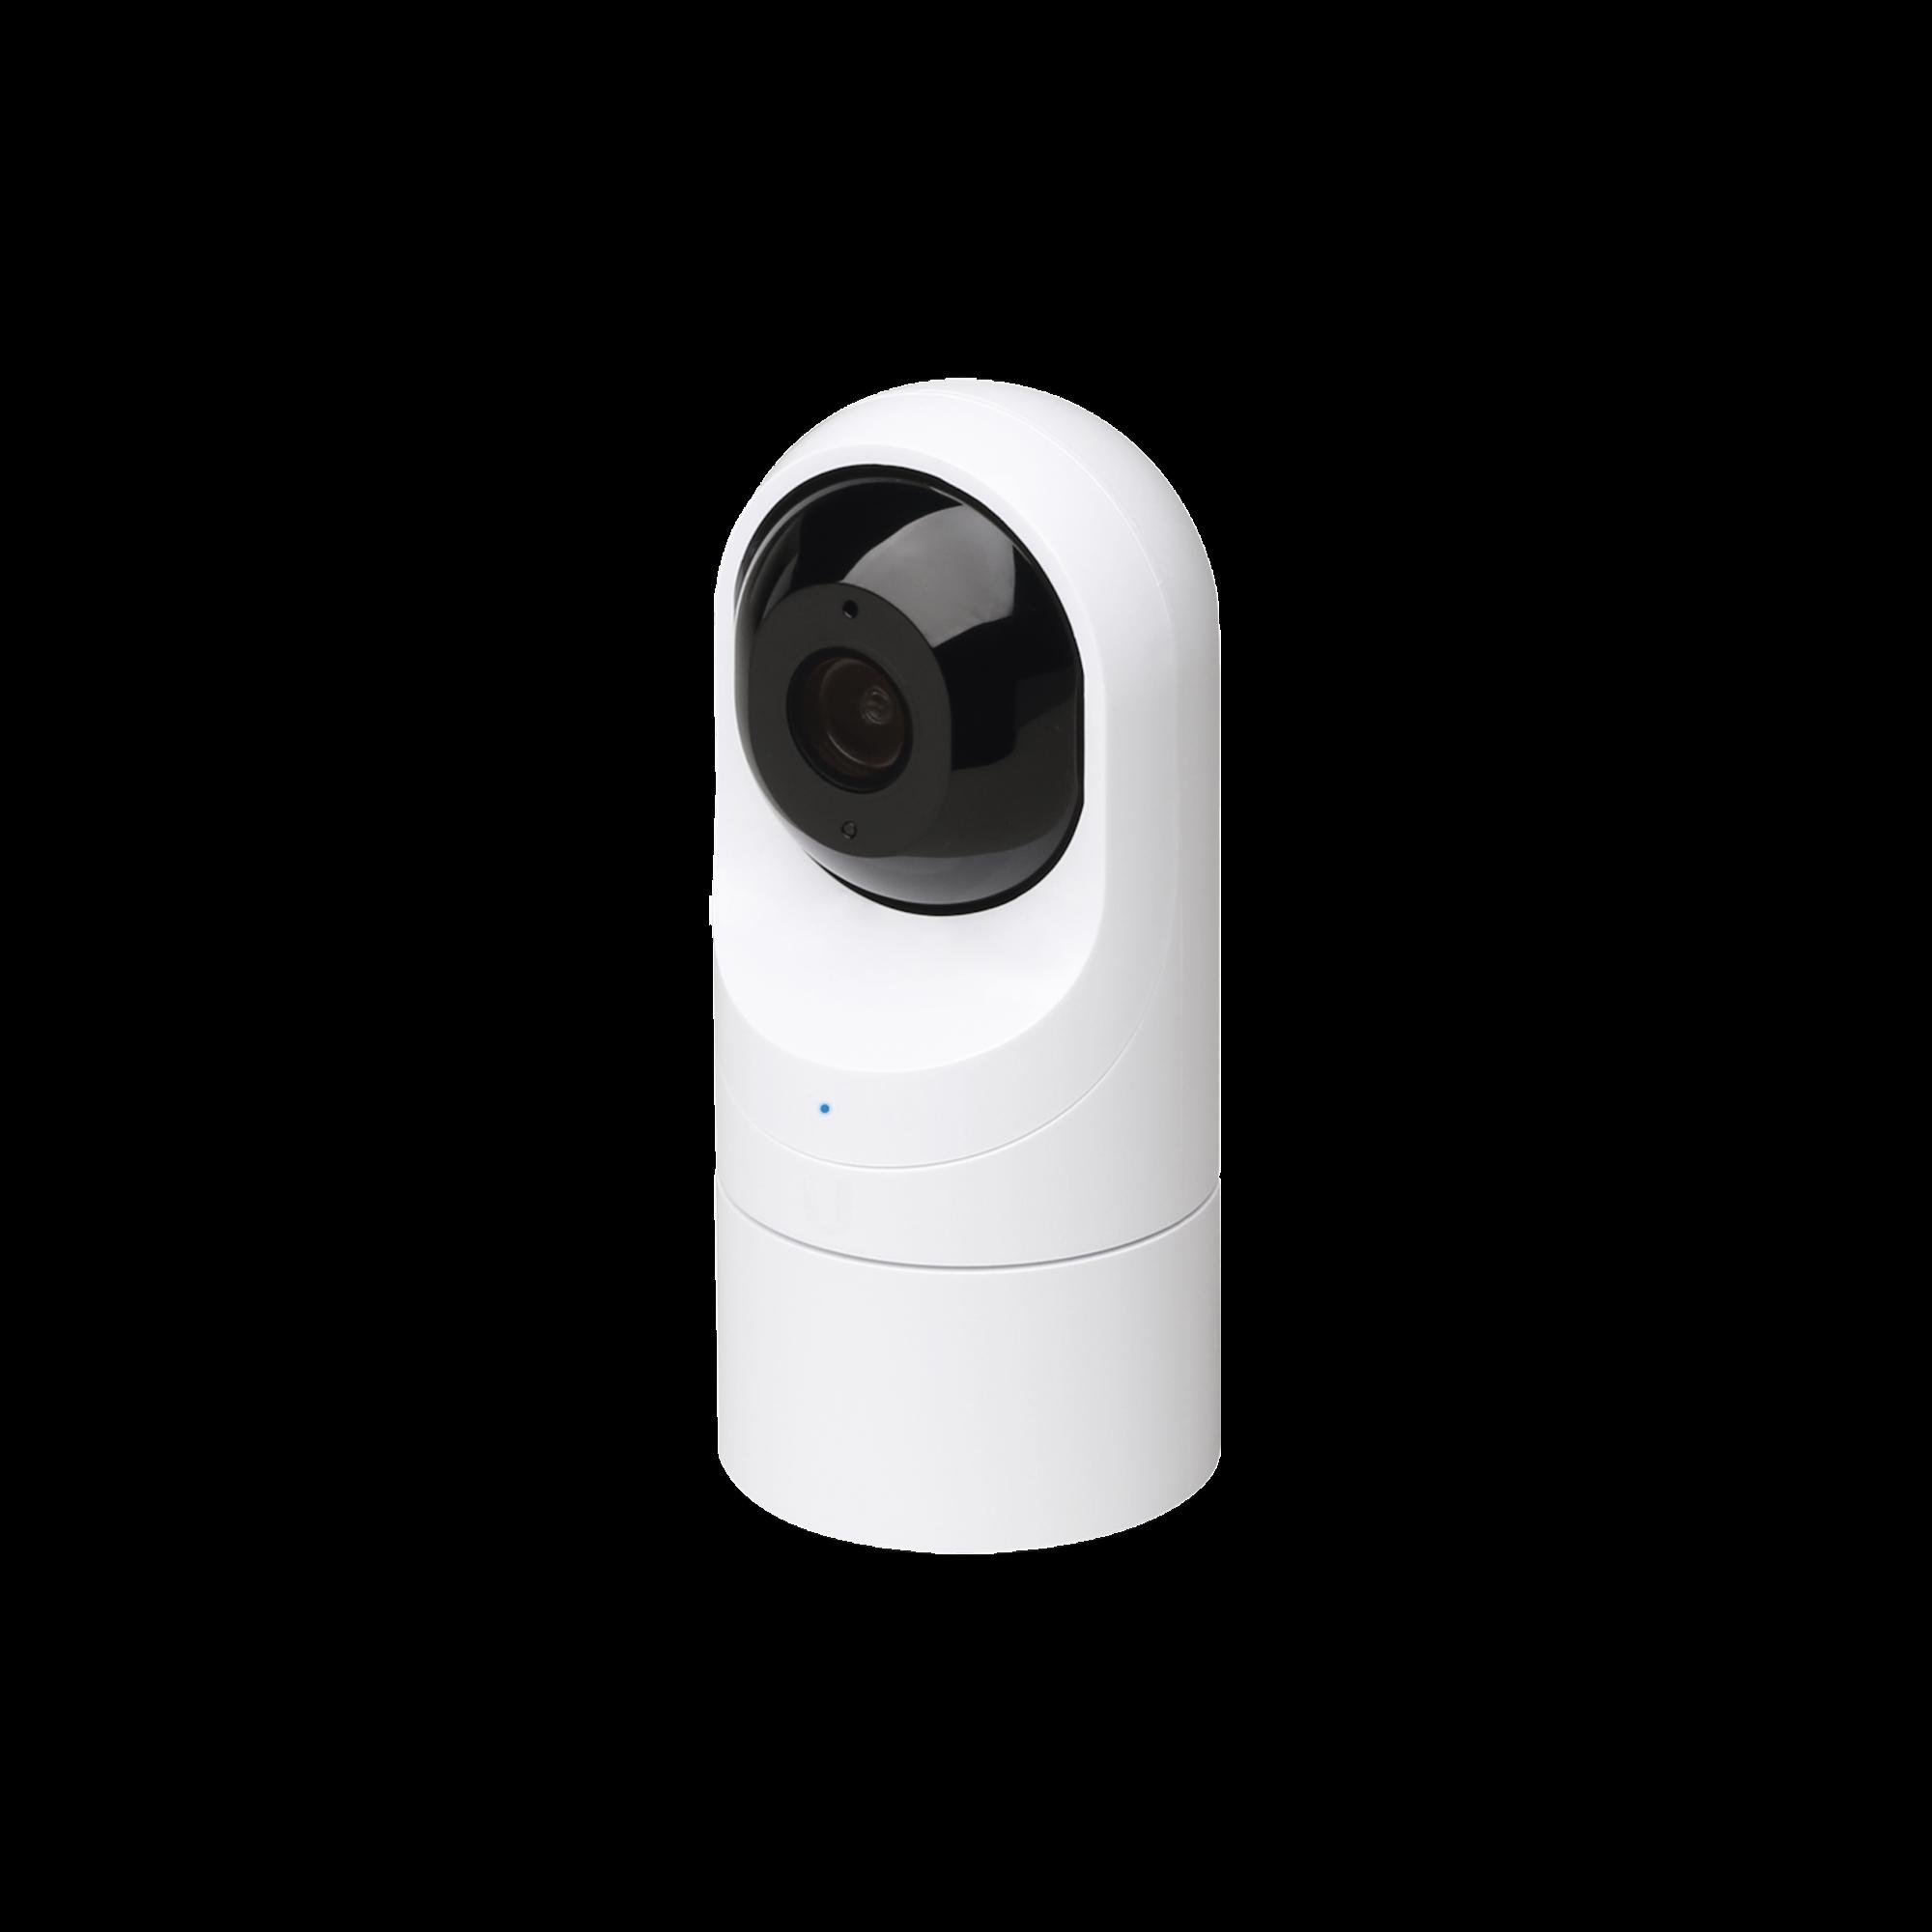 Cámara UniFi G3 FLEX para exterior o interior 2MP con micrófono y vista nocturna, 802.3af, instalación en poste, techo o pared